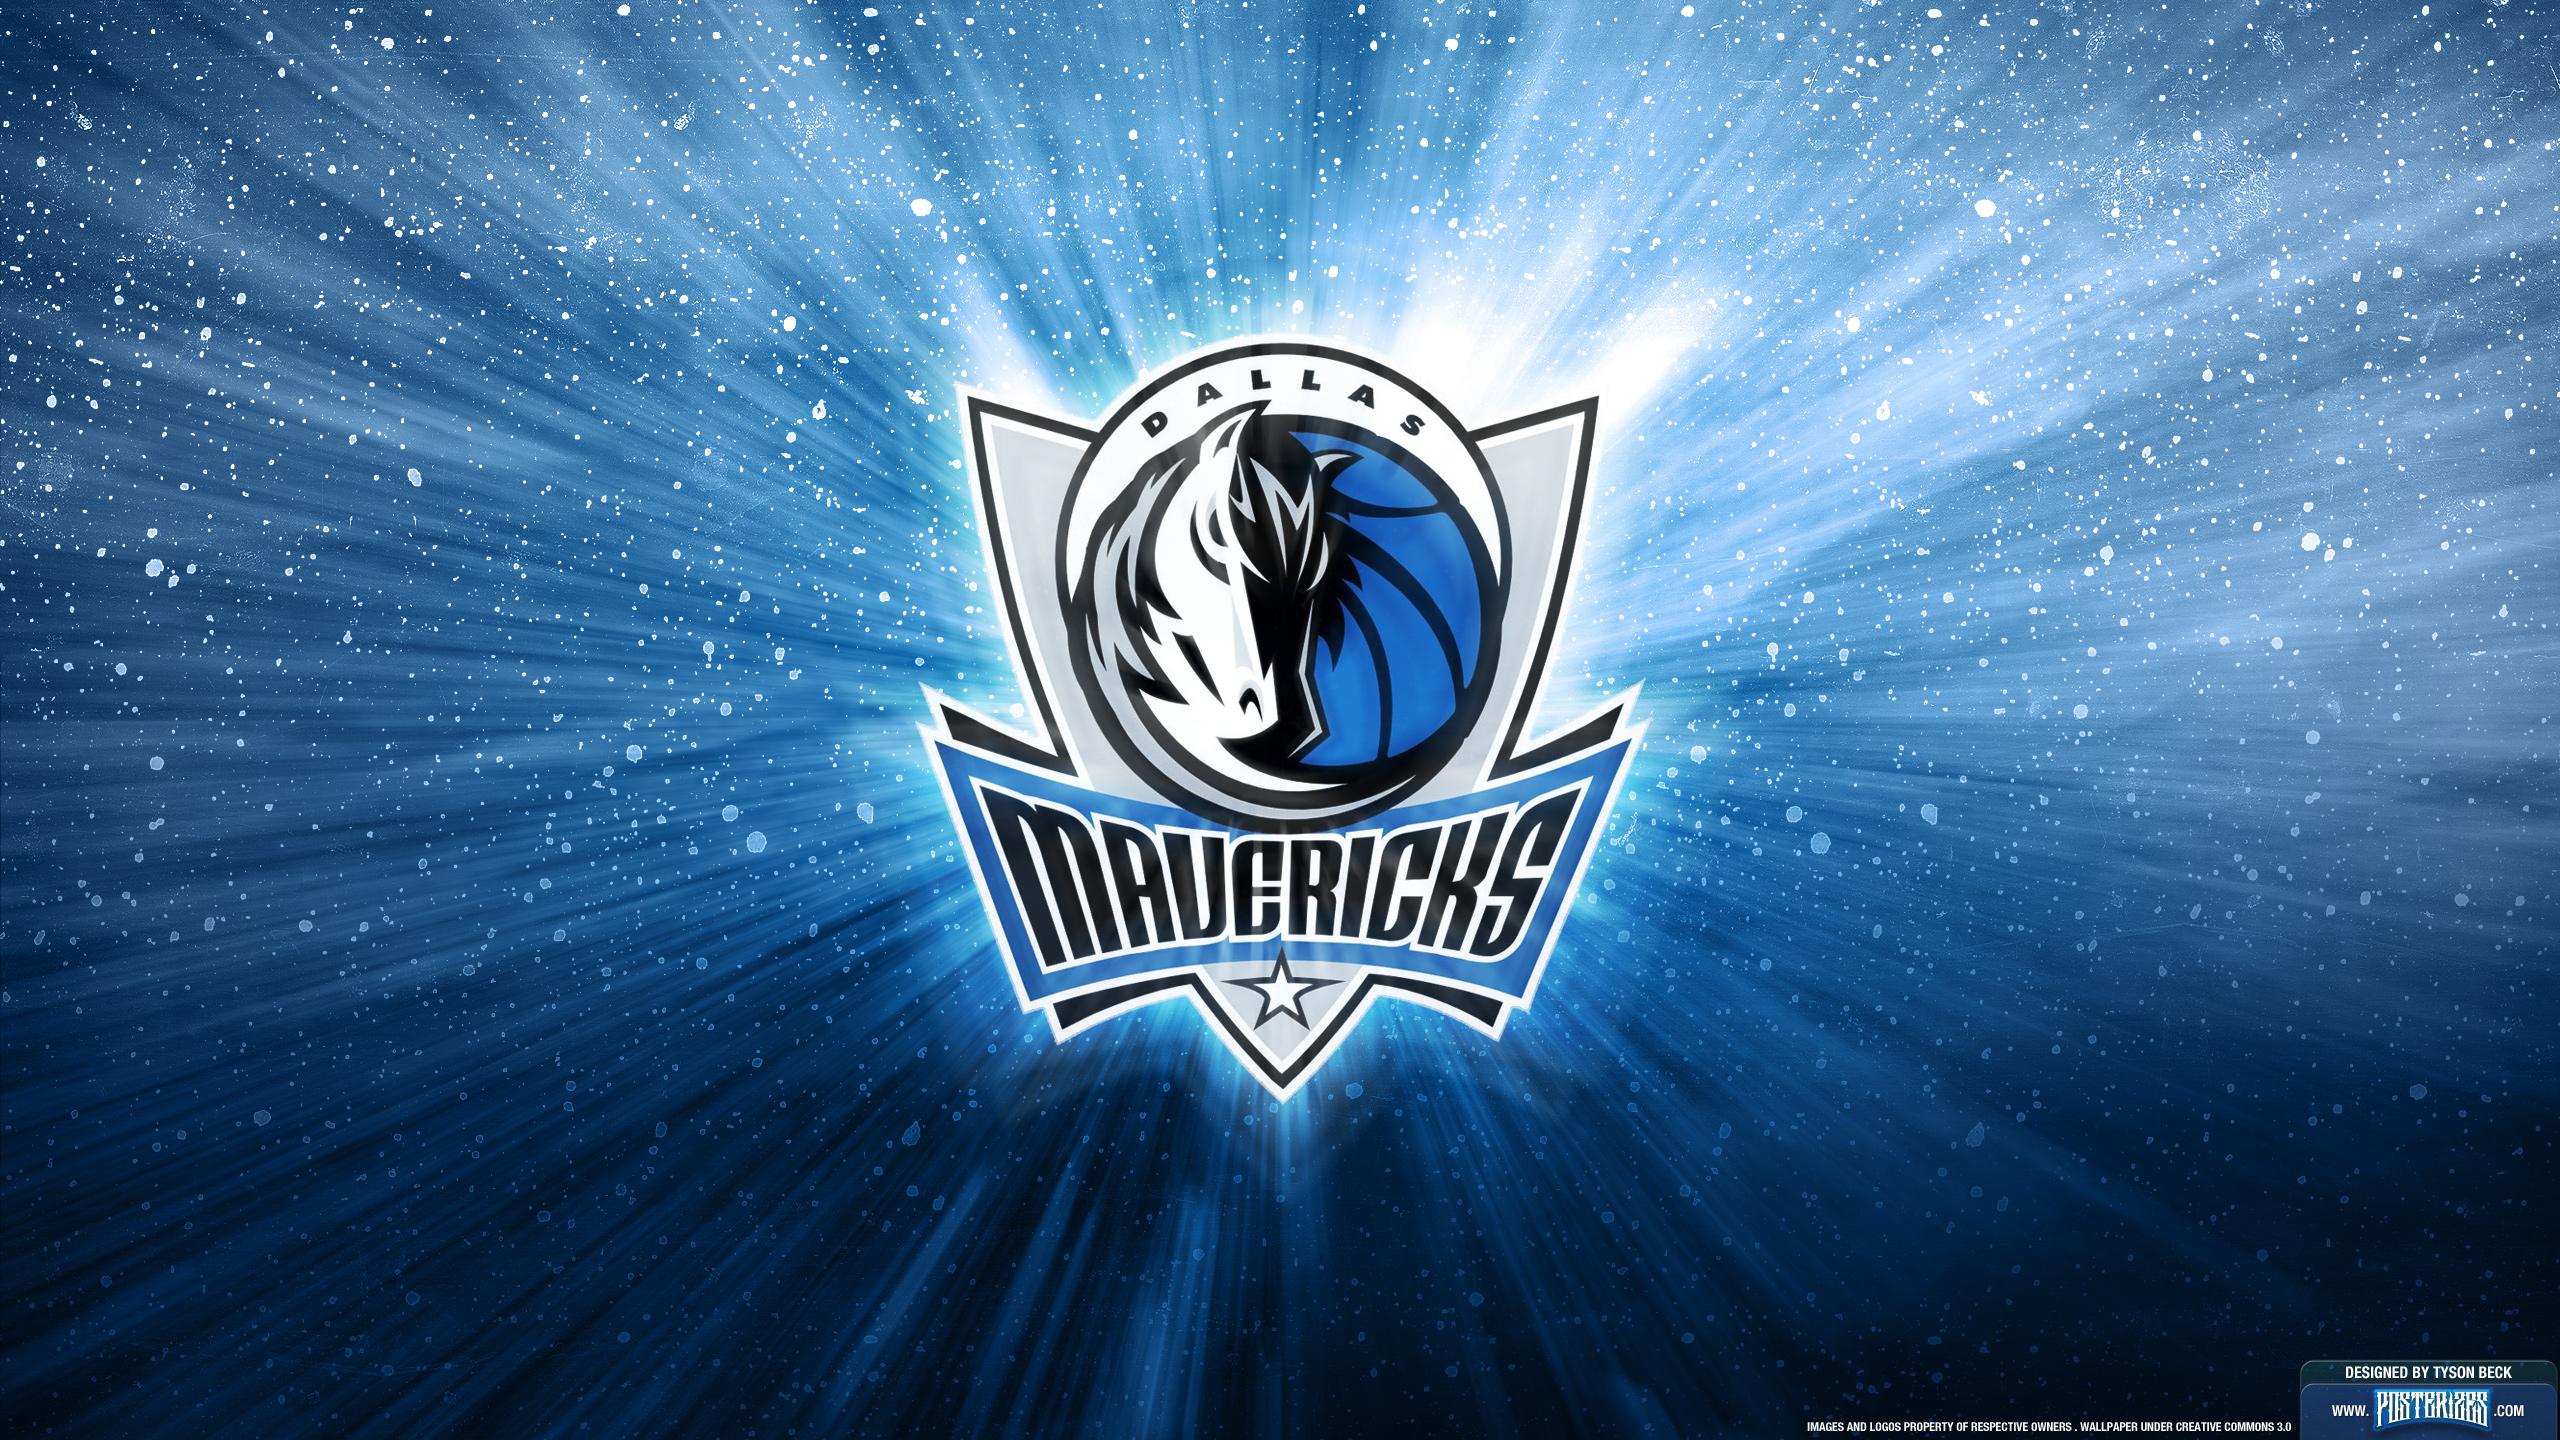 Dallas Mavericks NBA iPhone Wallpaper HD - 2020 NBA iPhone ... |Dallas Mavericks Wallpapers